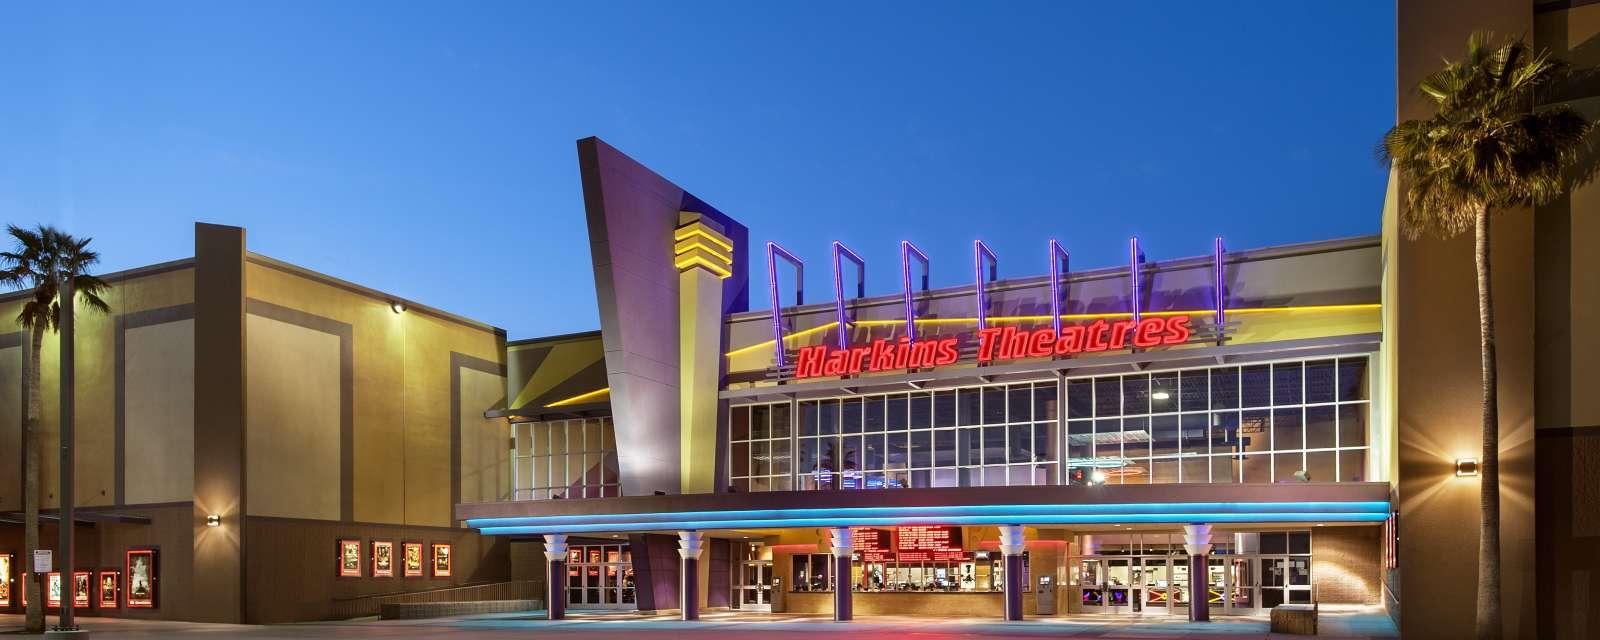 Chandler AZ Movie Theaters | Chandler Indoor Entertainment on